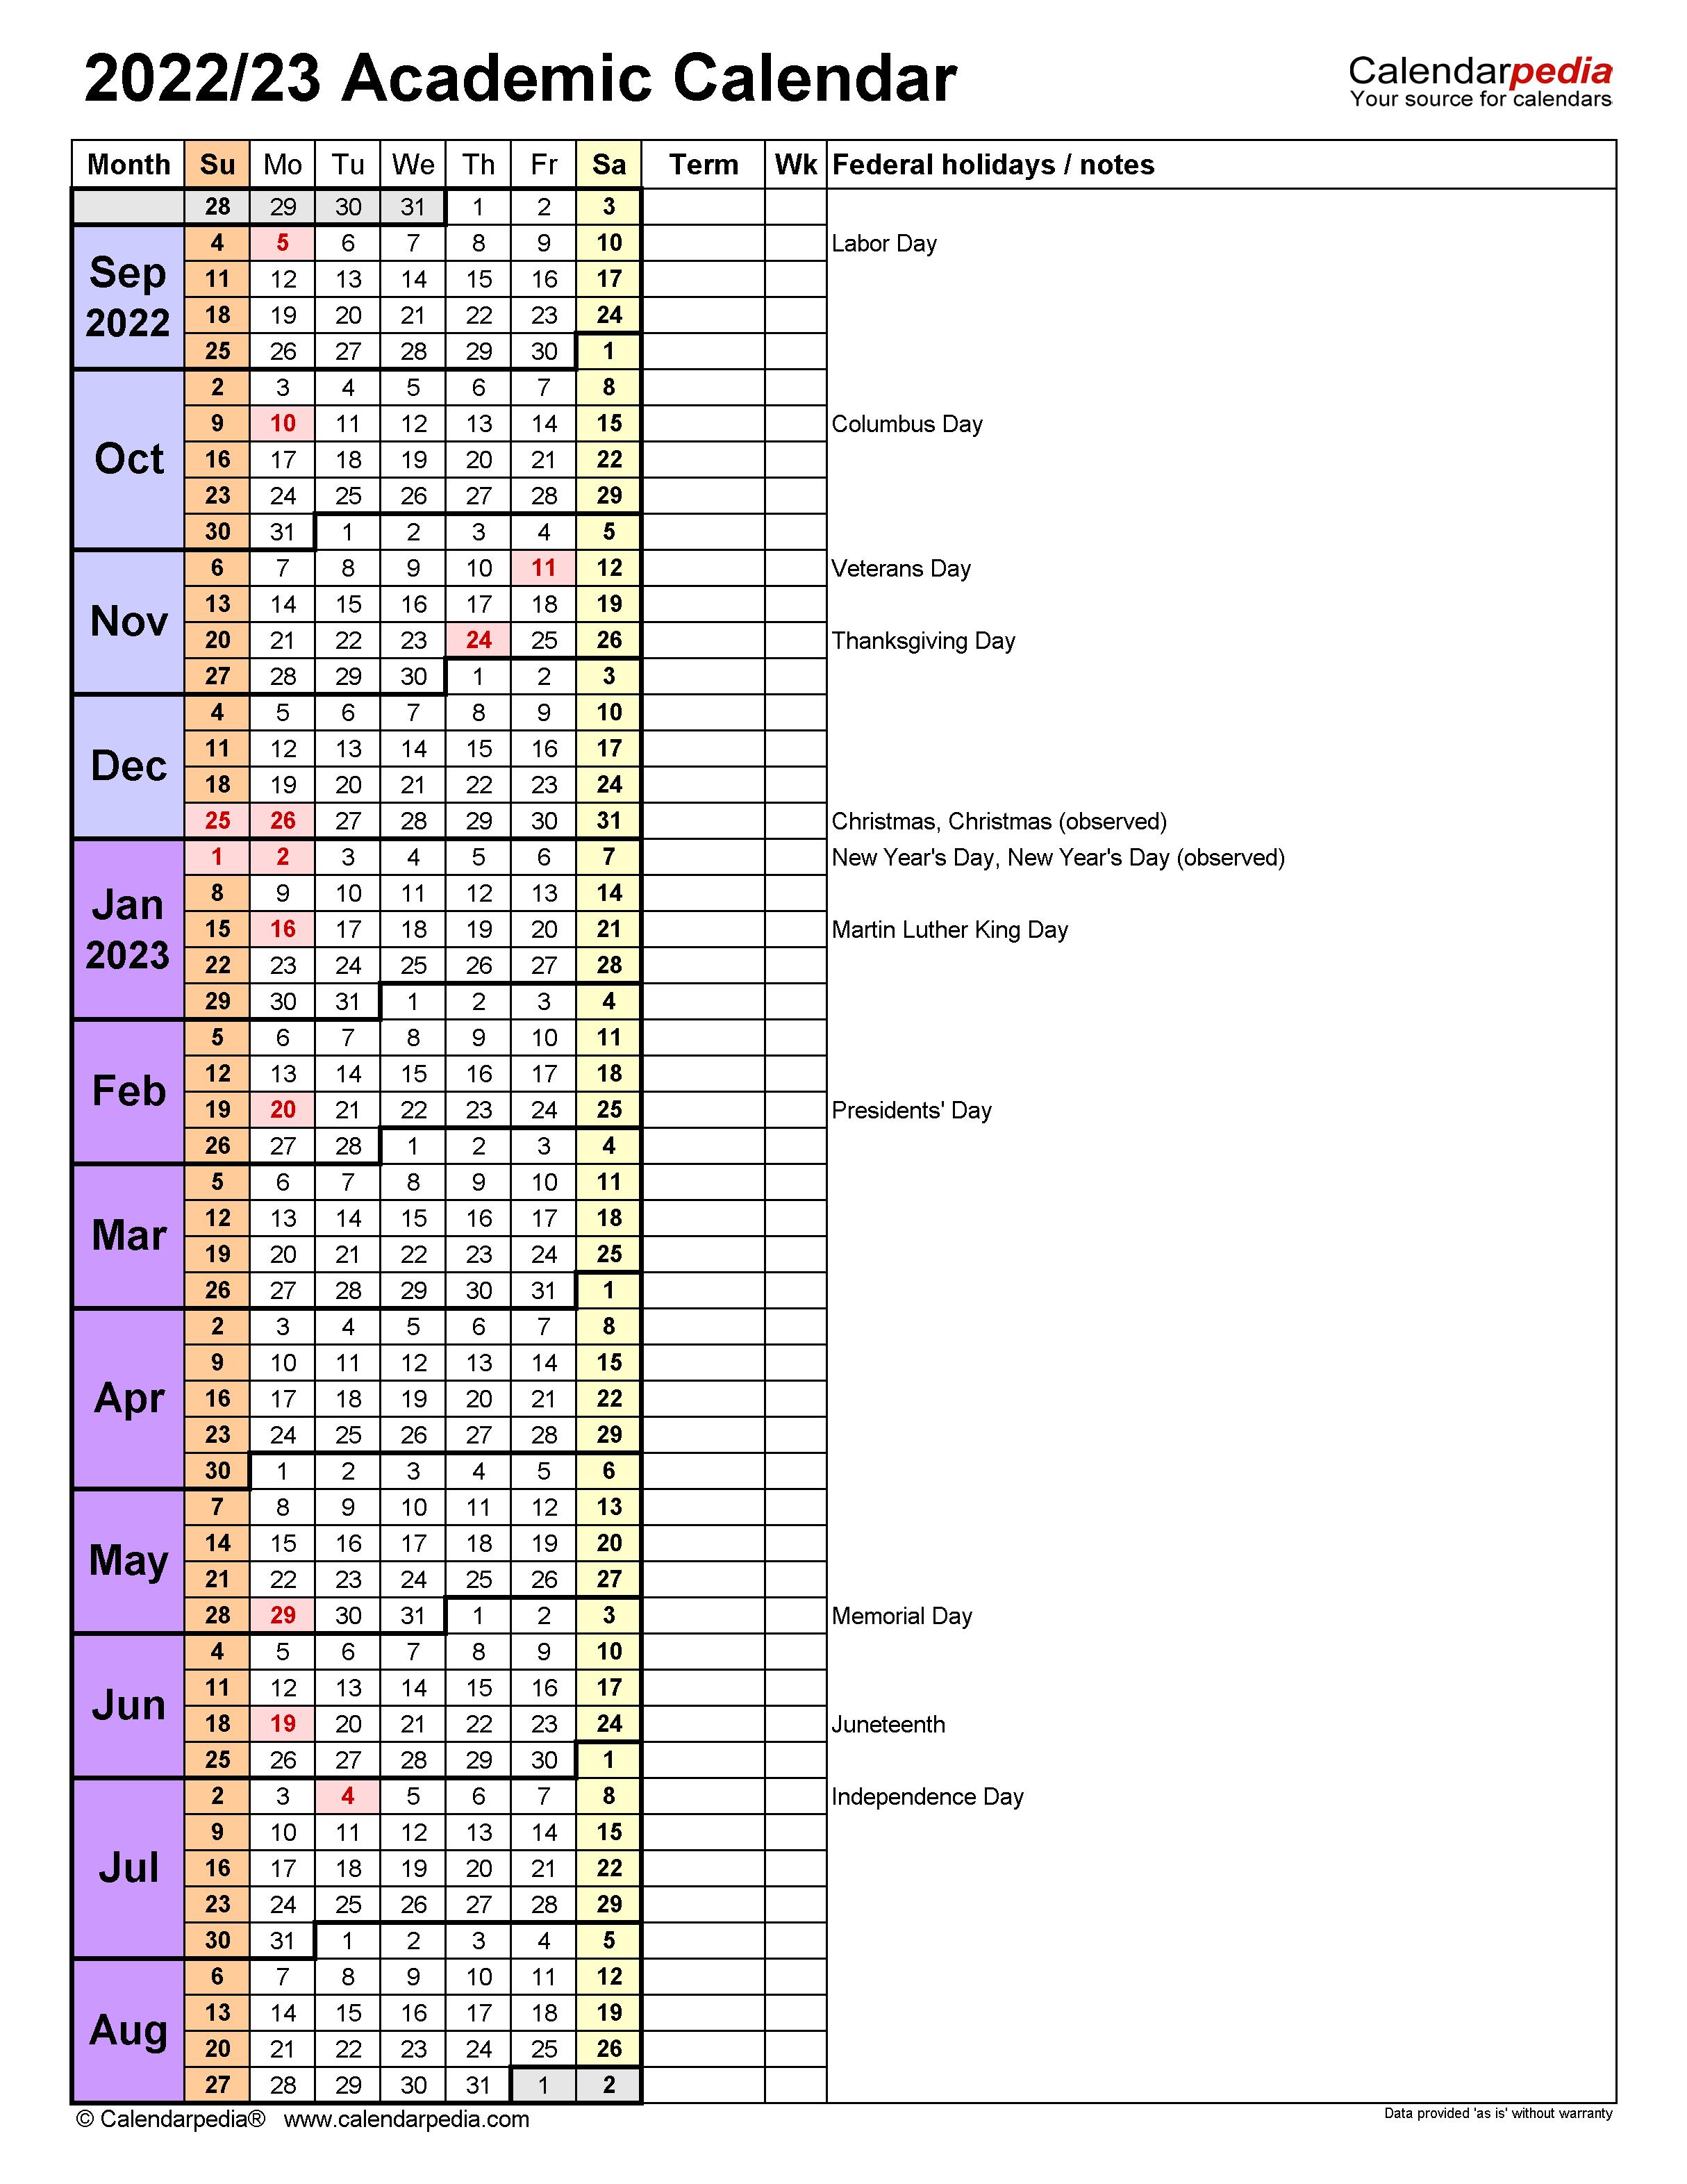 Wku Academic Calendar 2022.Academic Calendars 2022 2023 Free Printable Word Templates